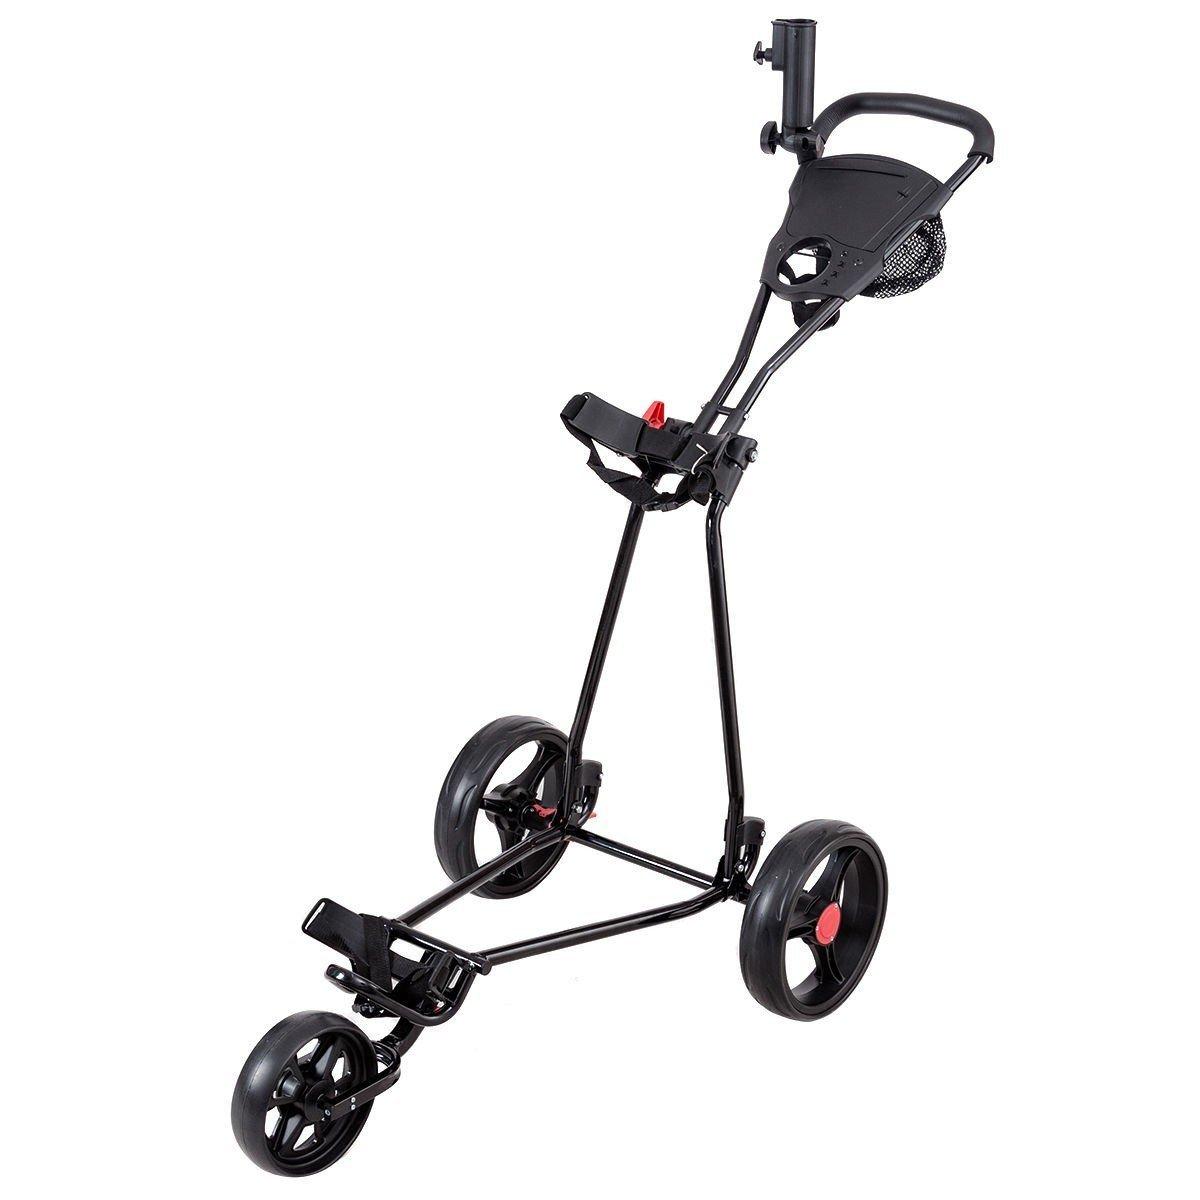 Apontus Durable Foldable Steel Golf Cart with Mesh Bag